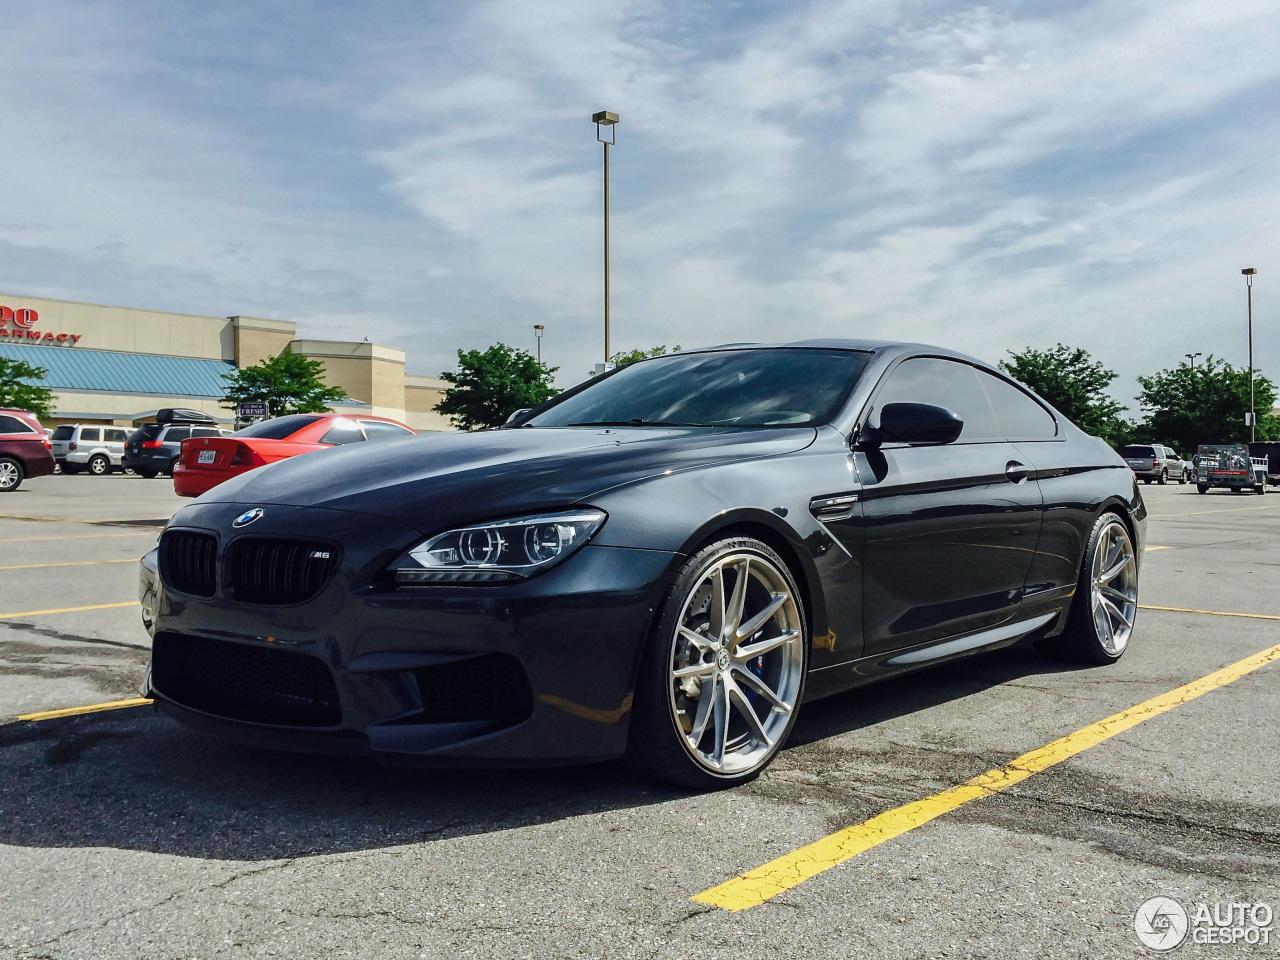 2017 Bmw M6 Gran Coupe >> BMW M6 F13 - 23 June 2014 - Autogespot